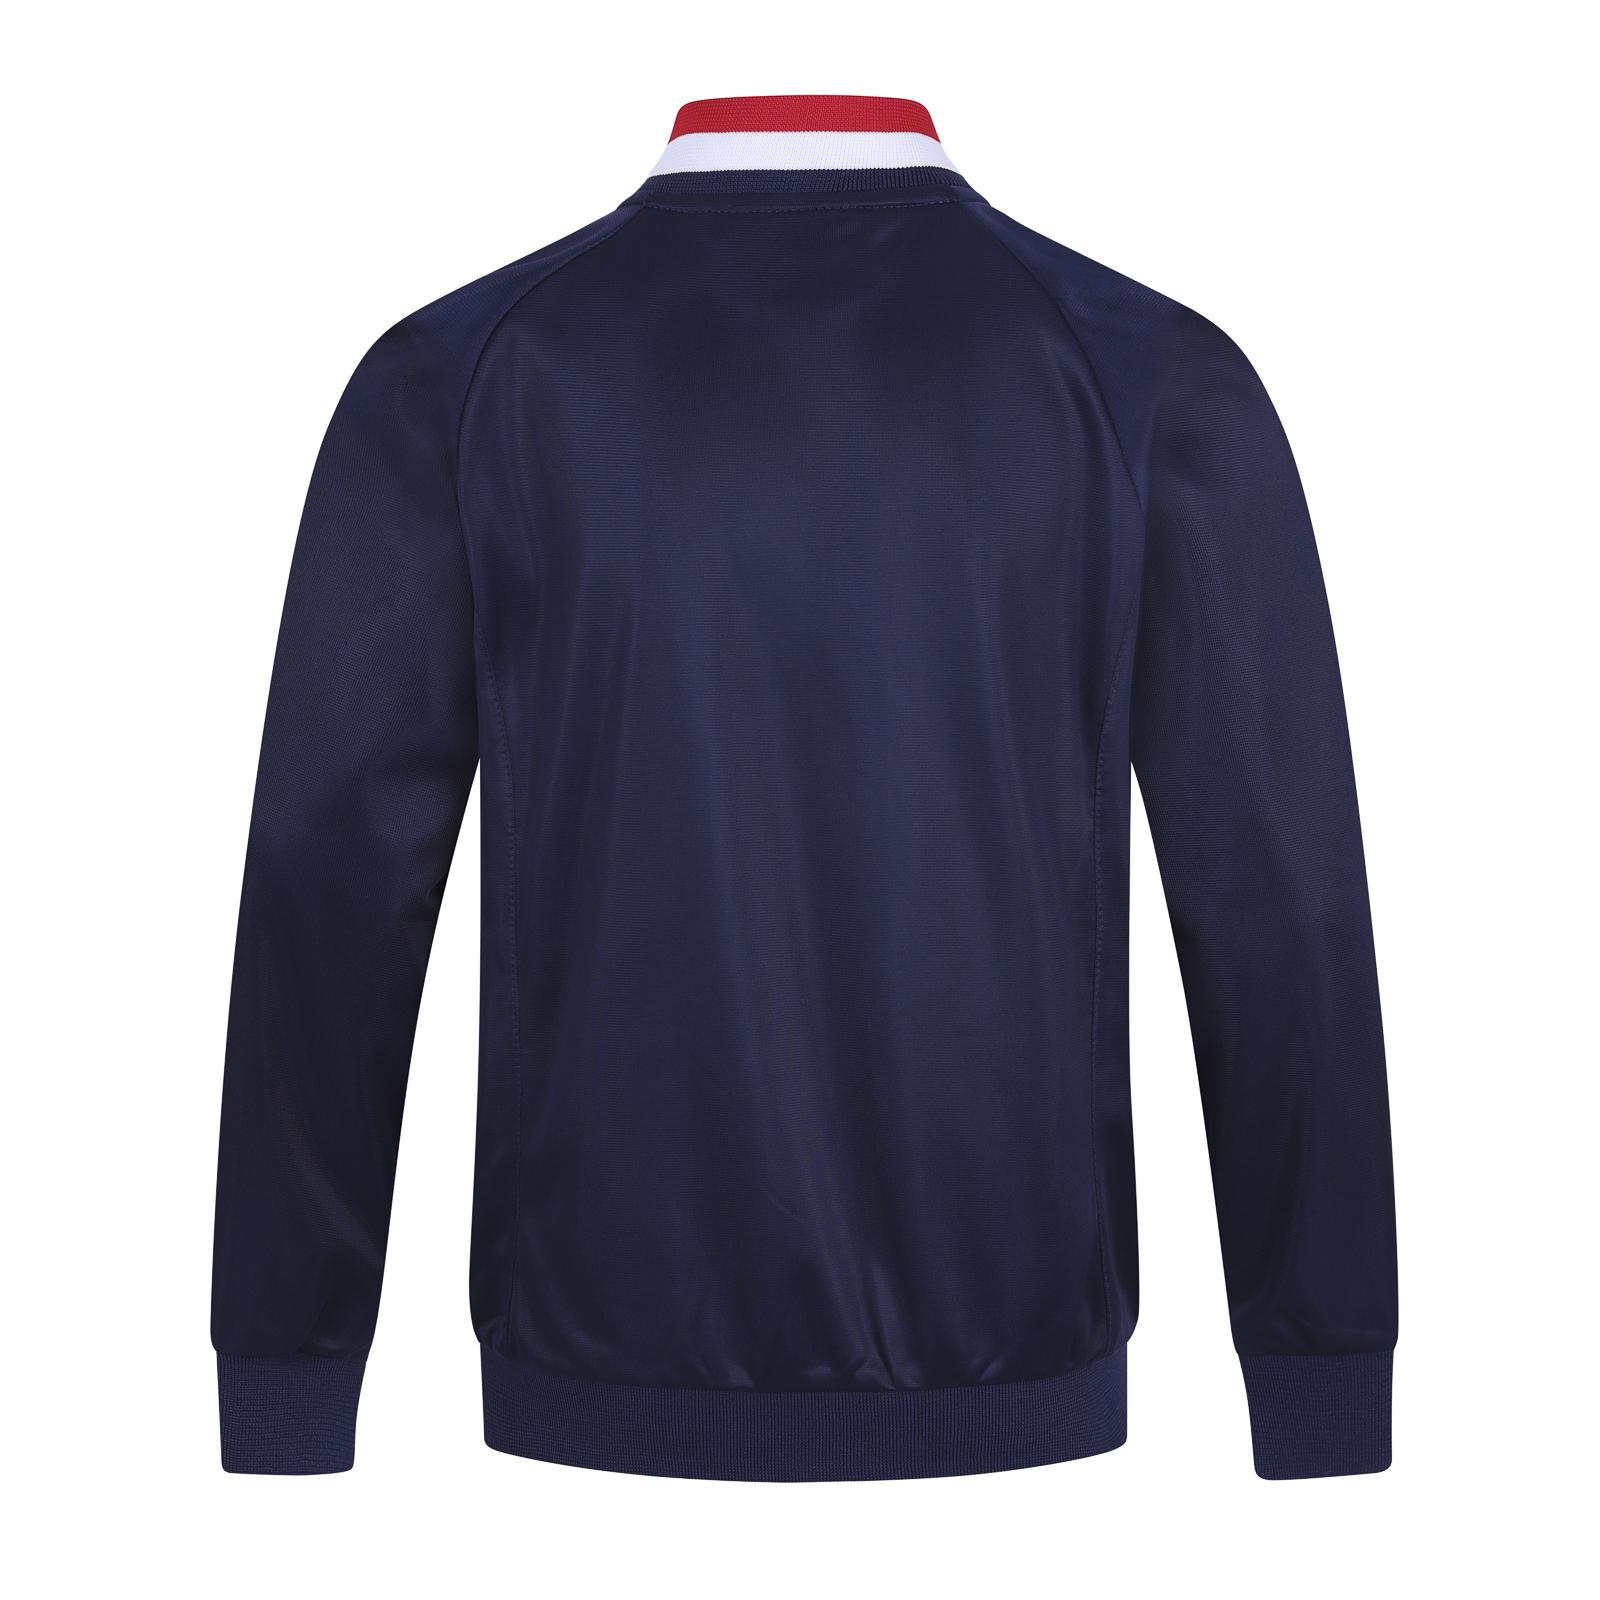 Arsenal-FC-Official-Football-Gift-Mens-Retro-Track-Top-Jacket 縮圖 6